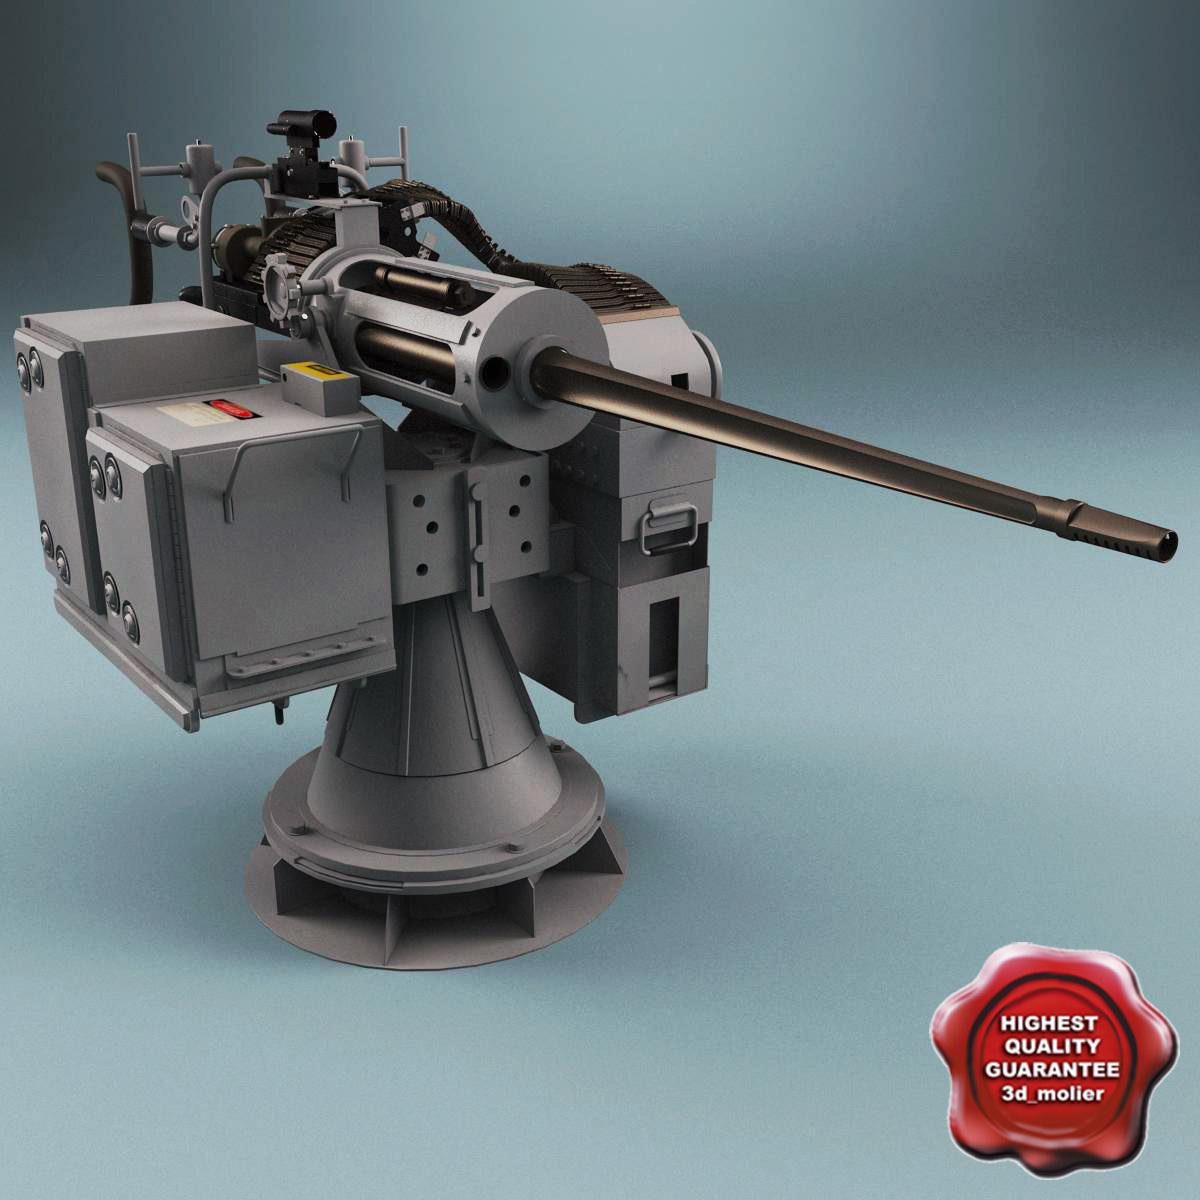 M242_Bushmaster_Chain_Gun_00.jpg